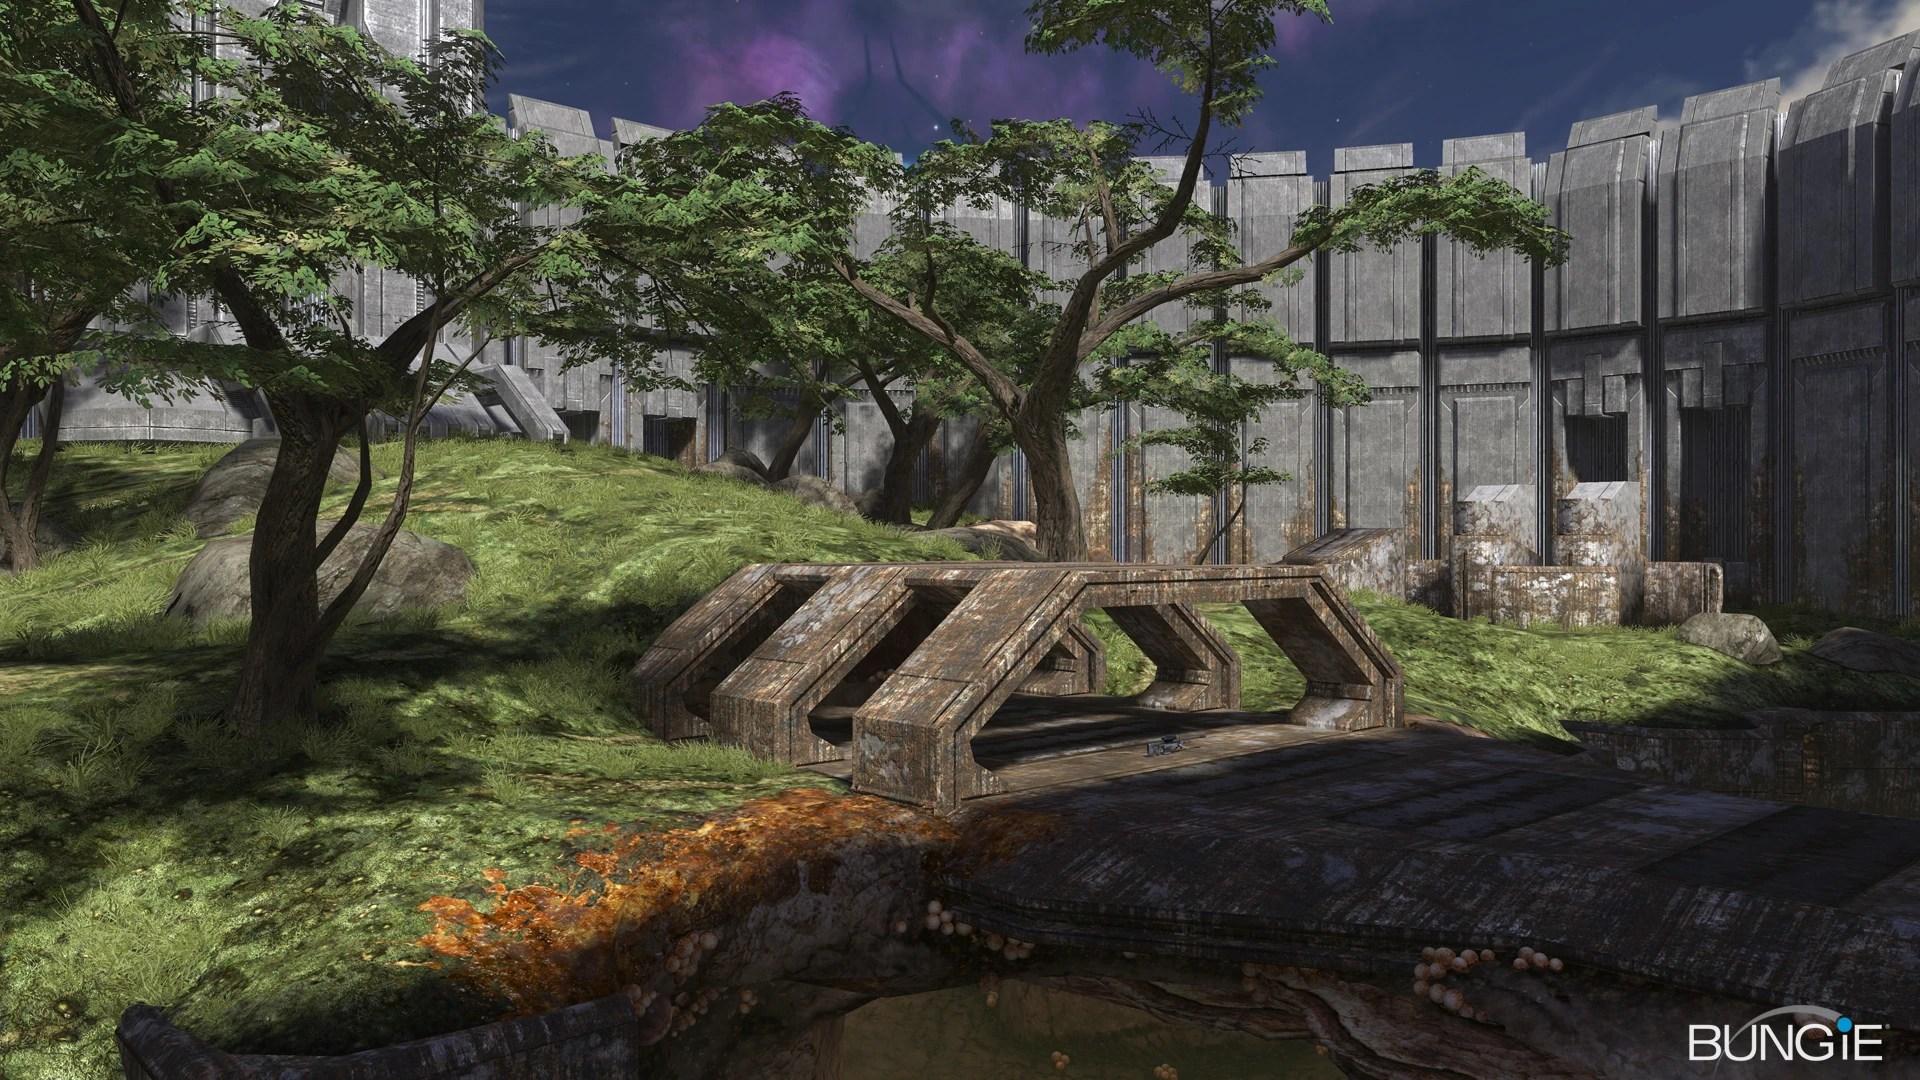 Halo Wallpaper Fall Of Reach Isolation Halo Nation Fandom Powered By Wikia